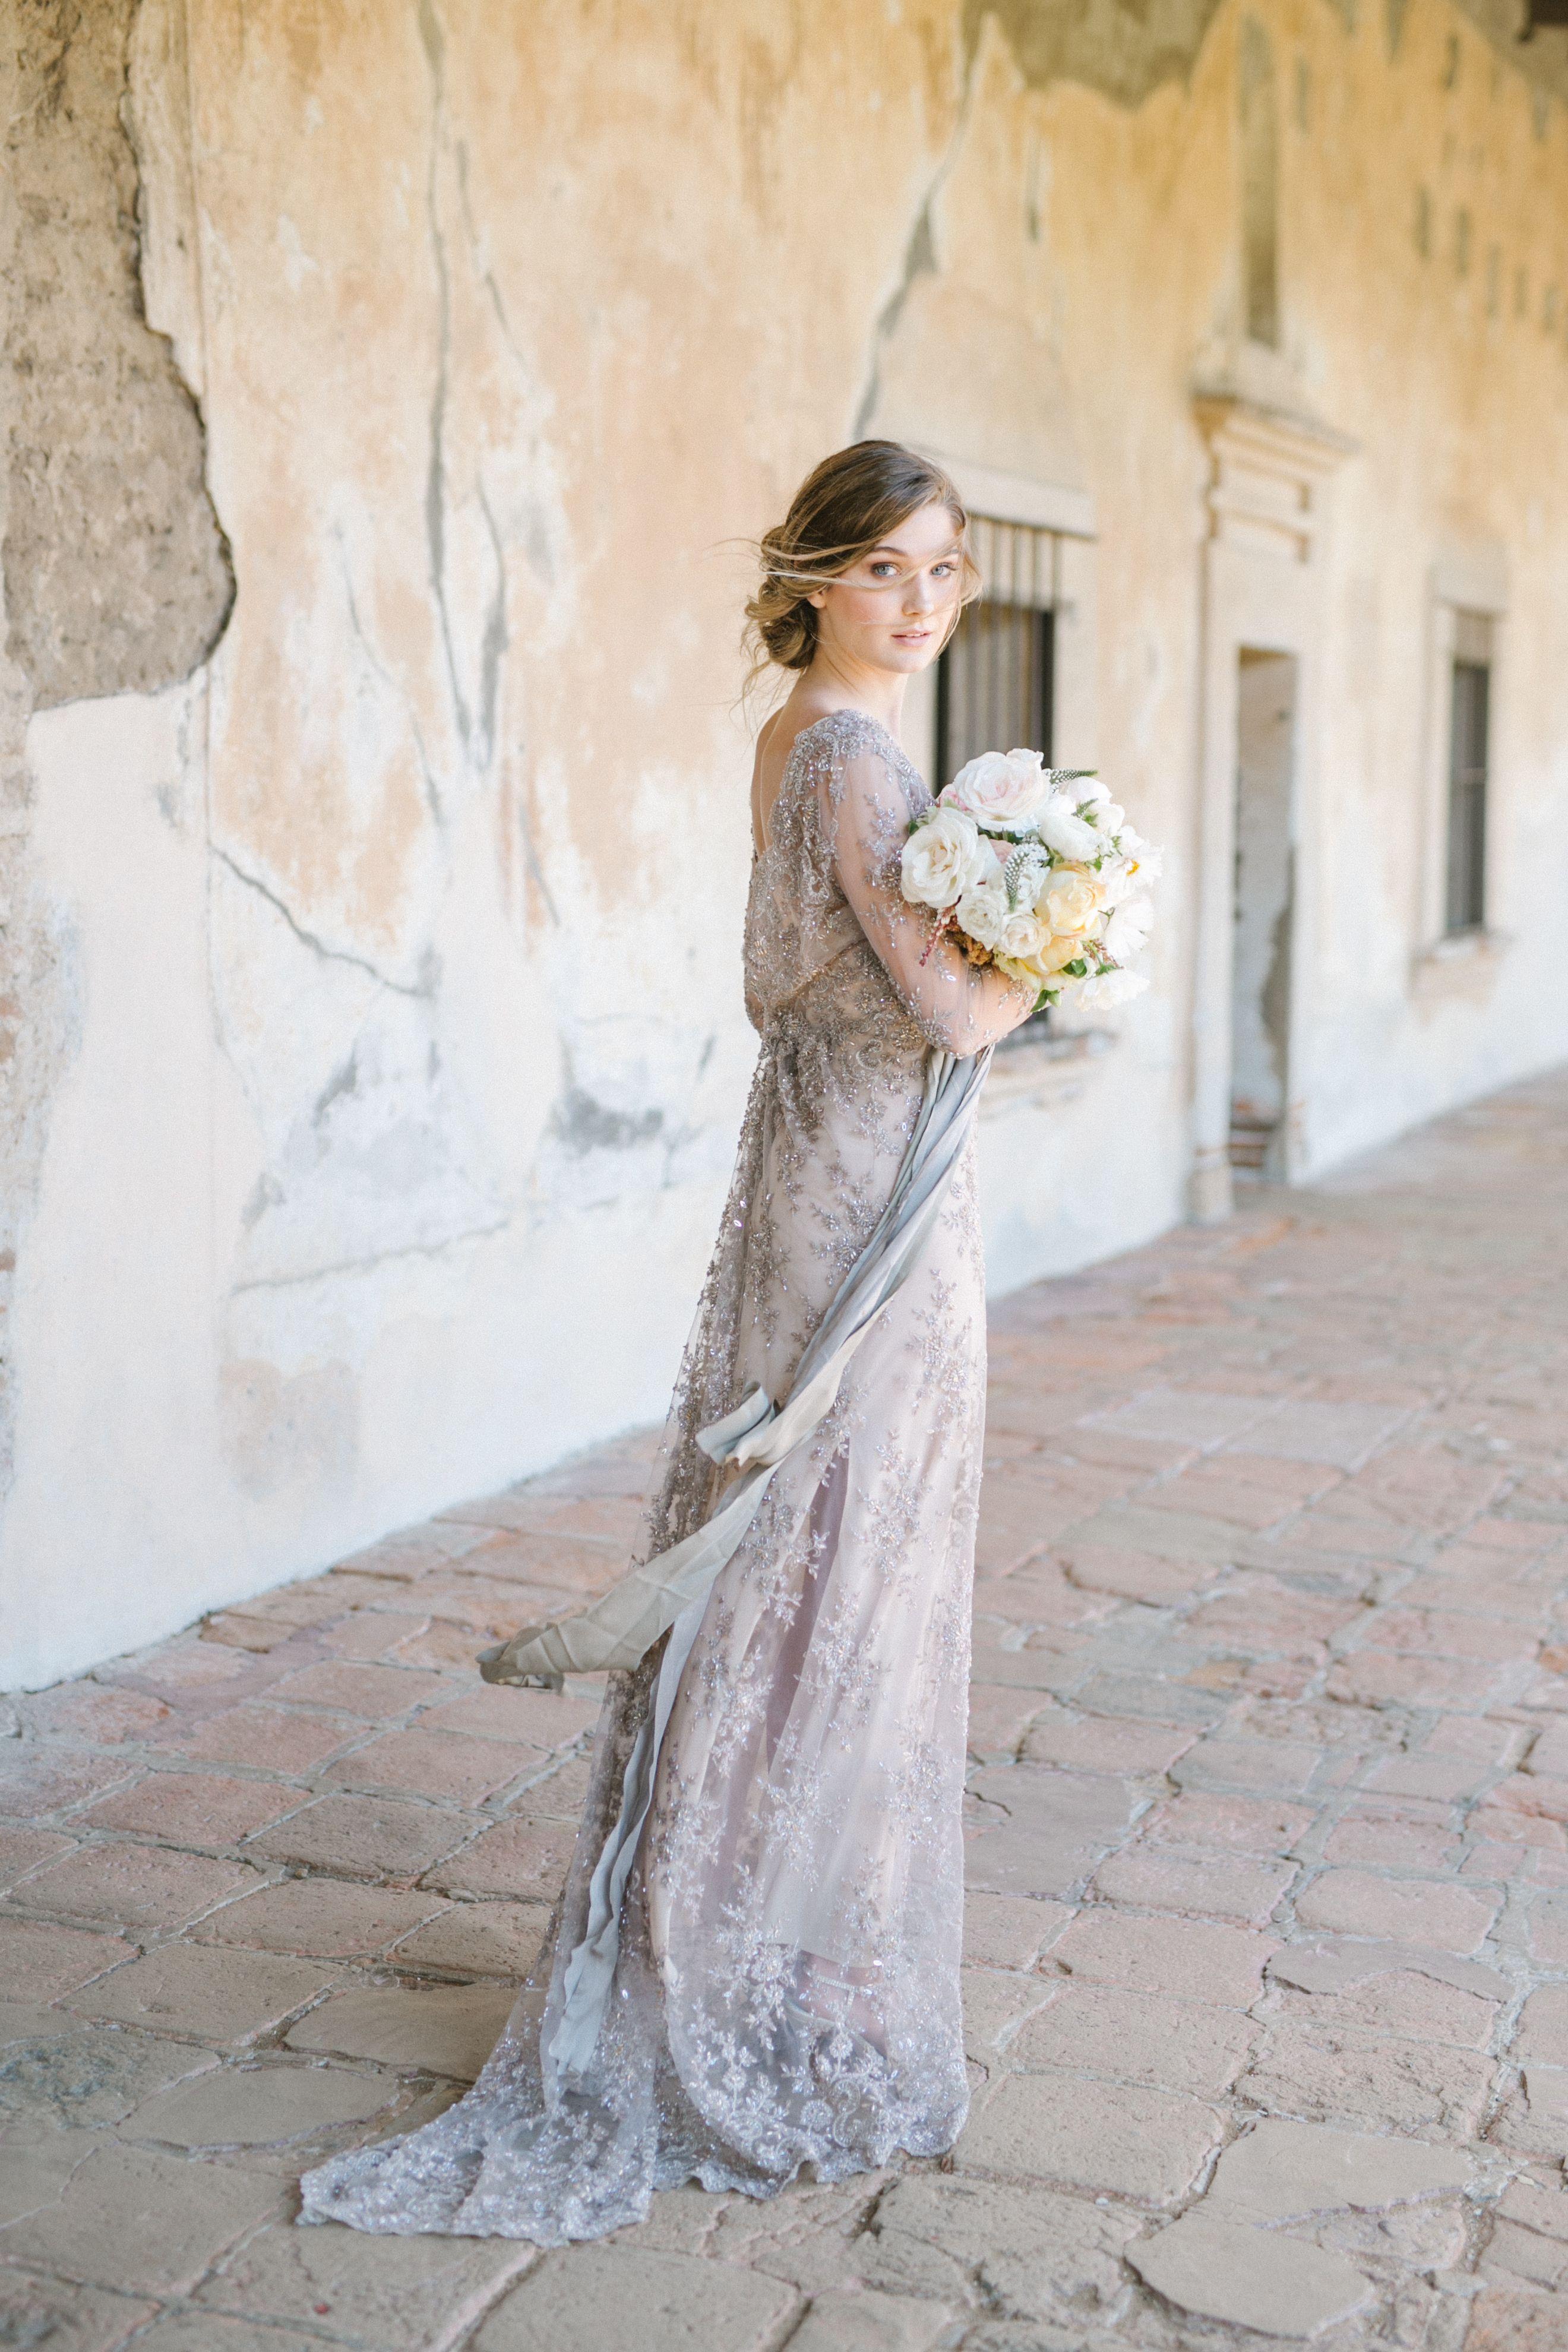 Blending Old + New for Bridal Style